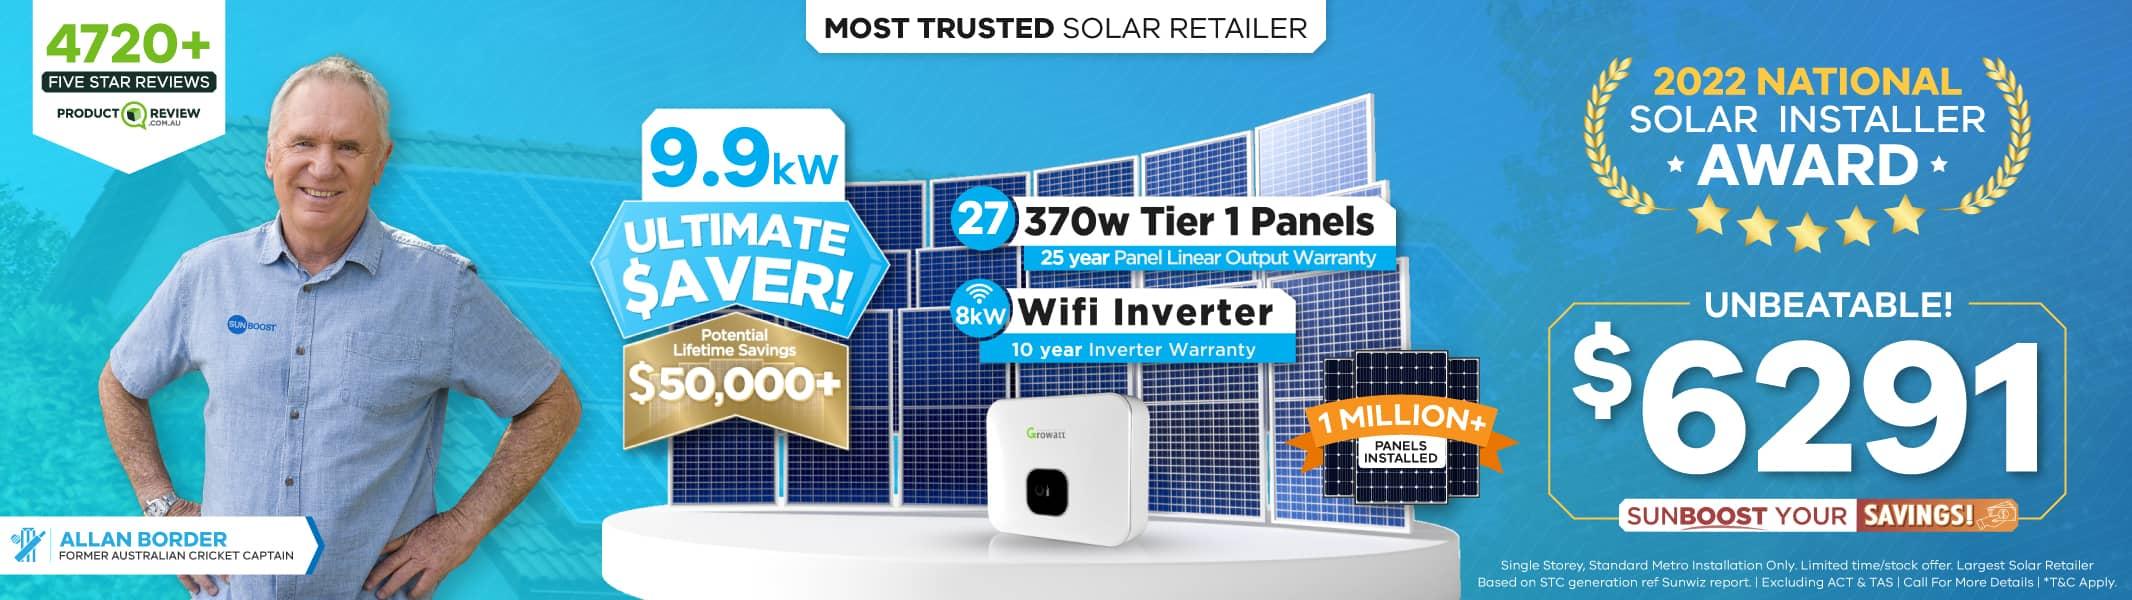 10kw solar system price Sunboost